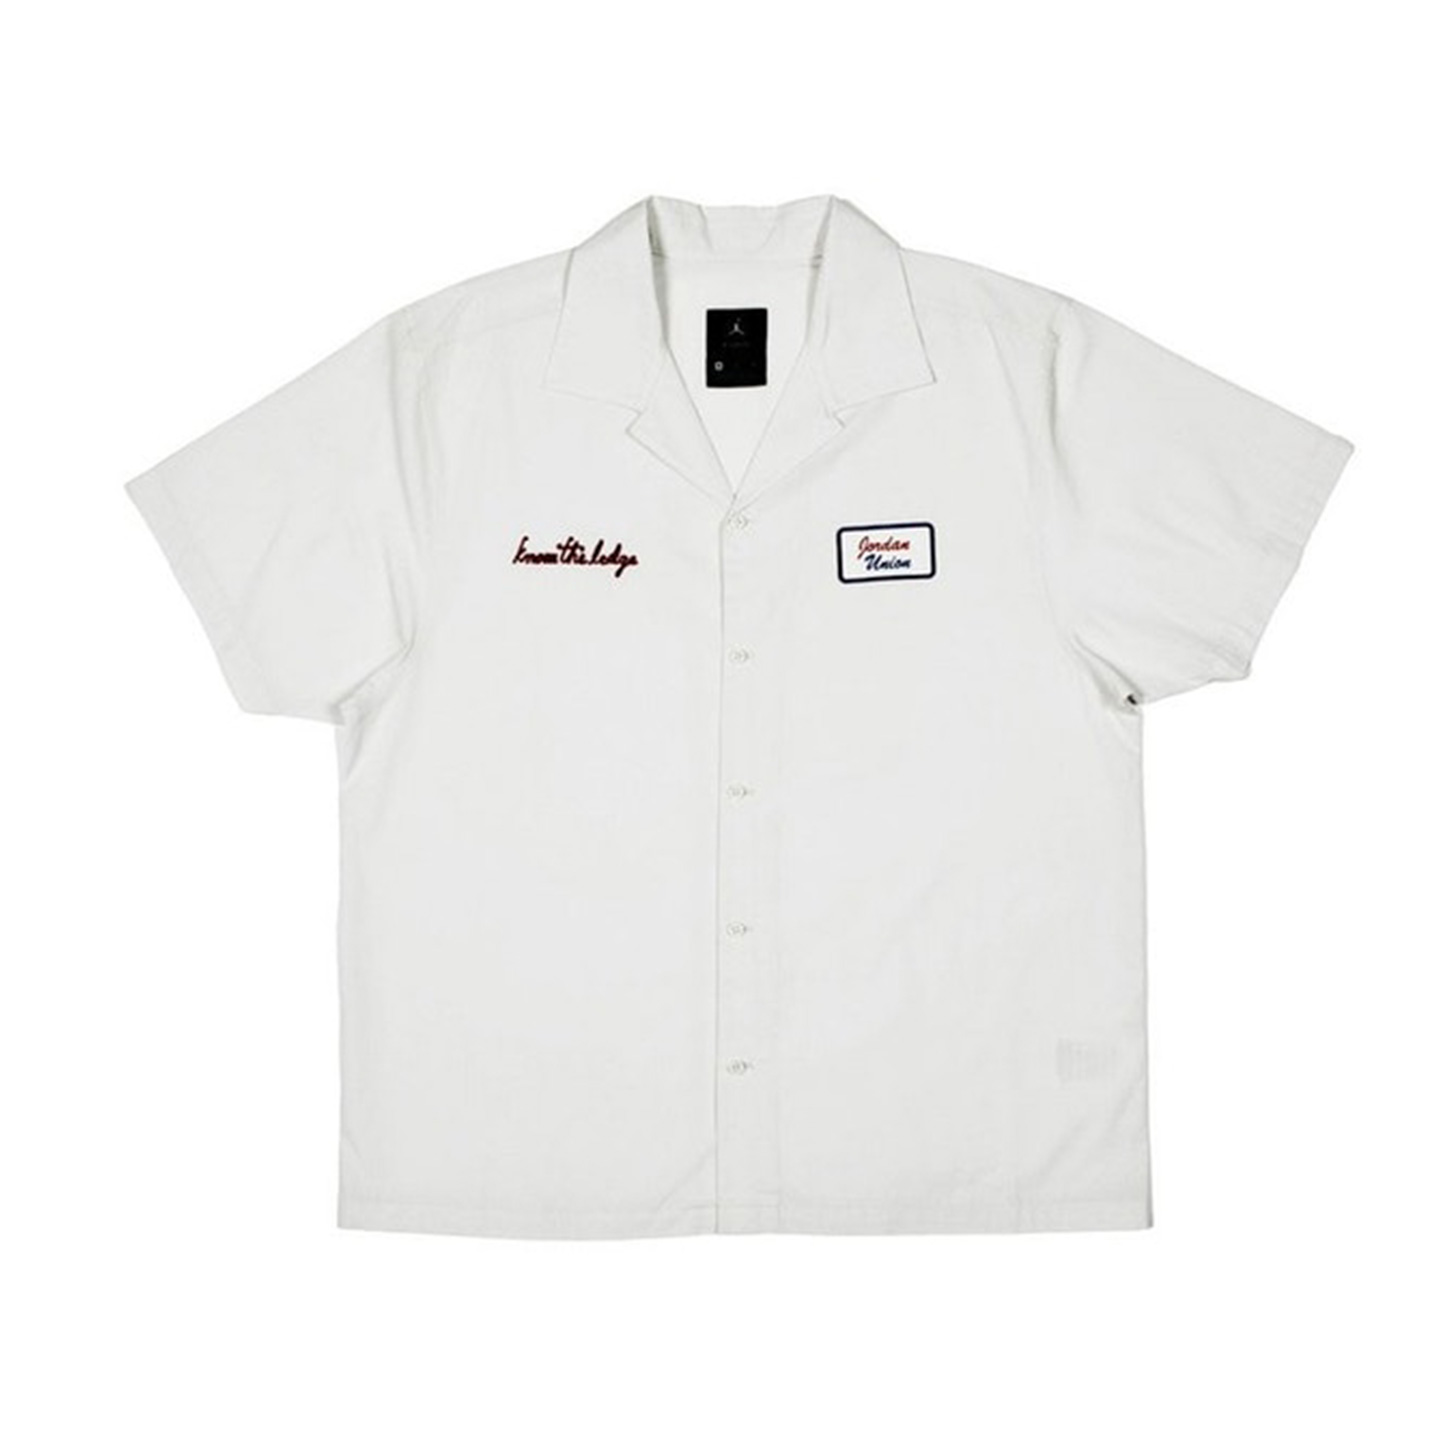 Jordan x Union Mechanic Shirt Platinum